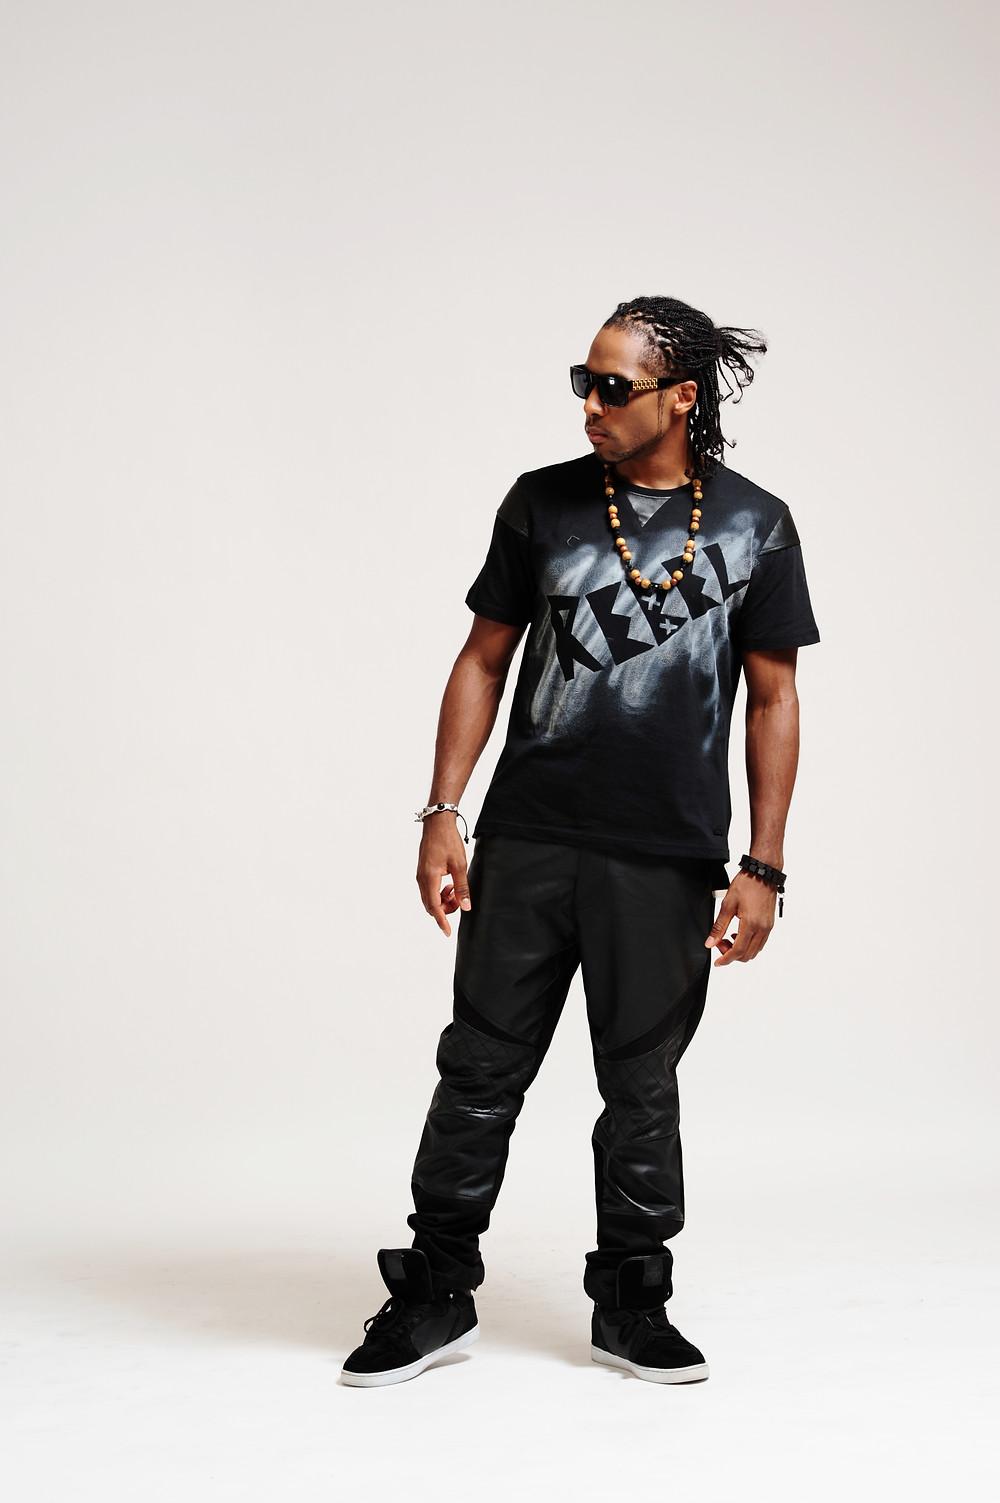 Black Jewelz Hip Hop artist